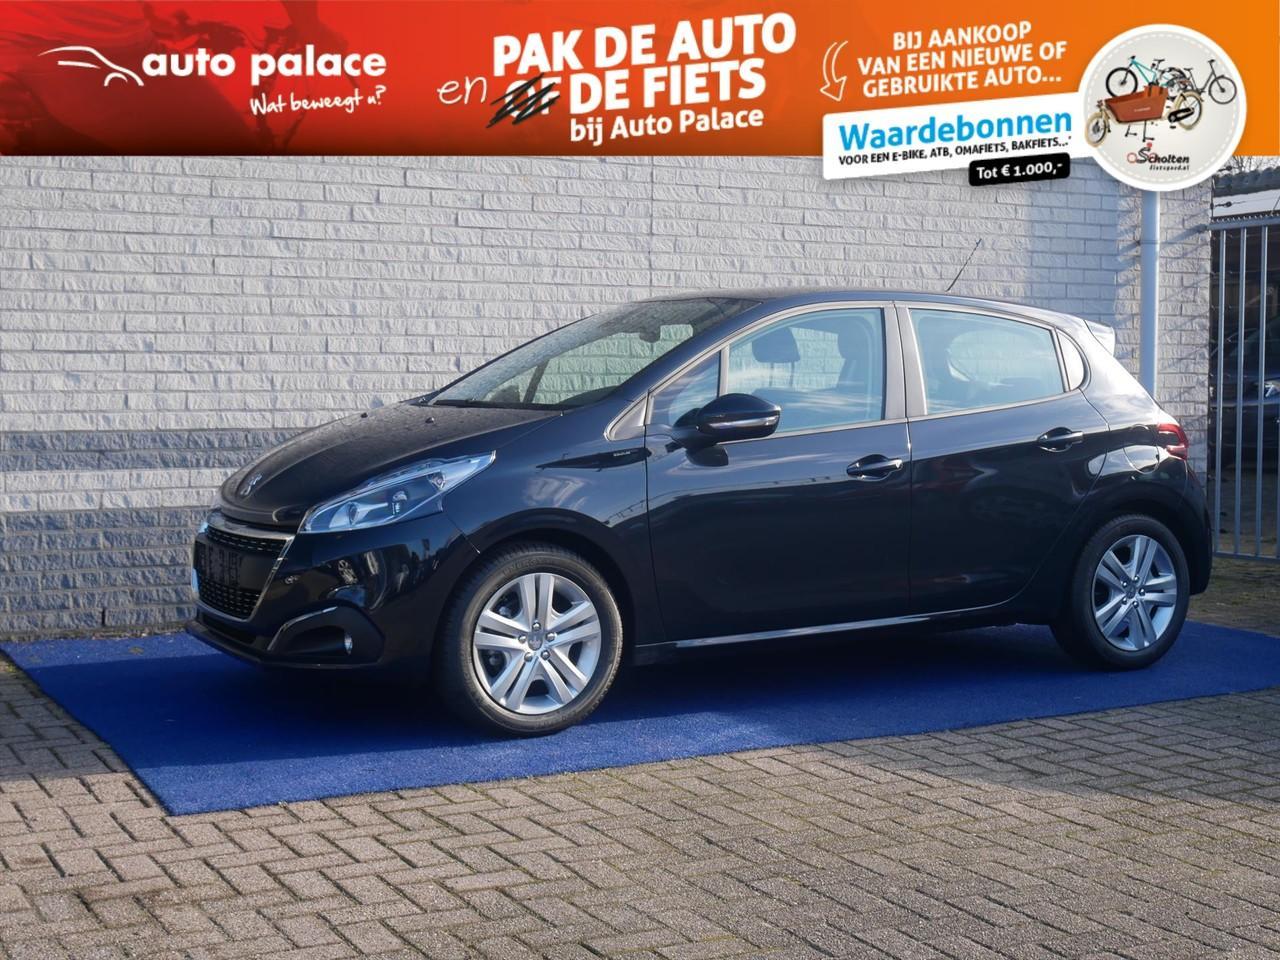 Peugeot 208 Signature 82pk airco navigatie sensoren achter cruise